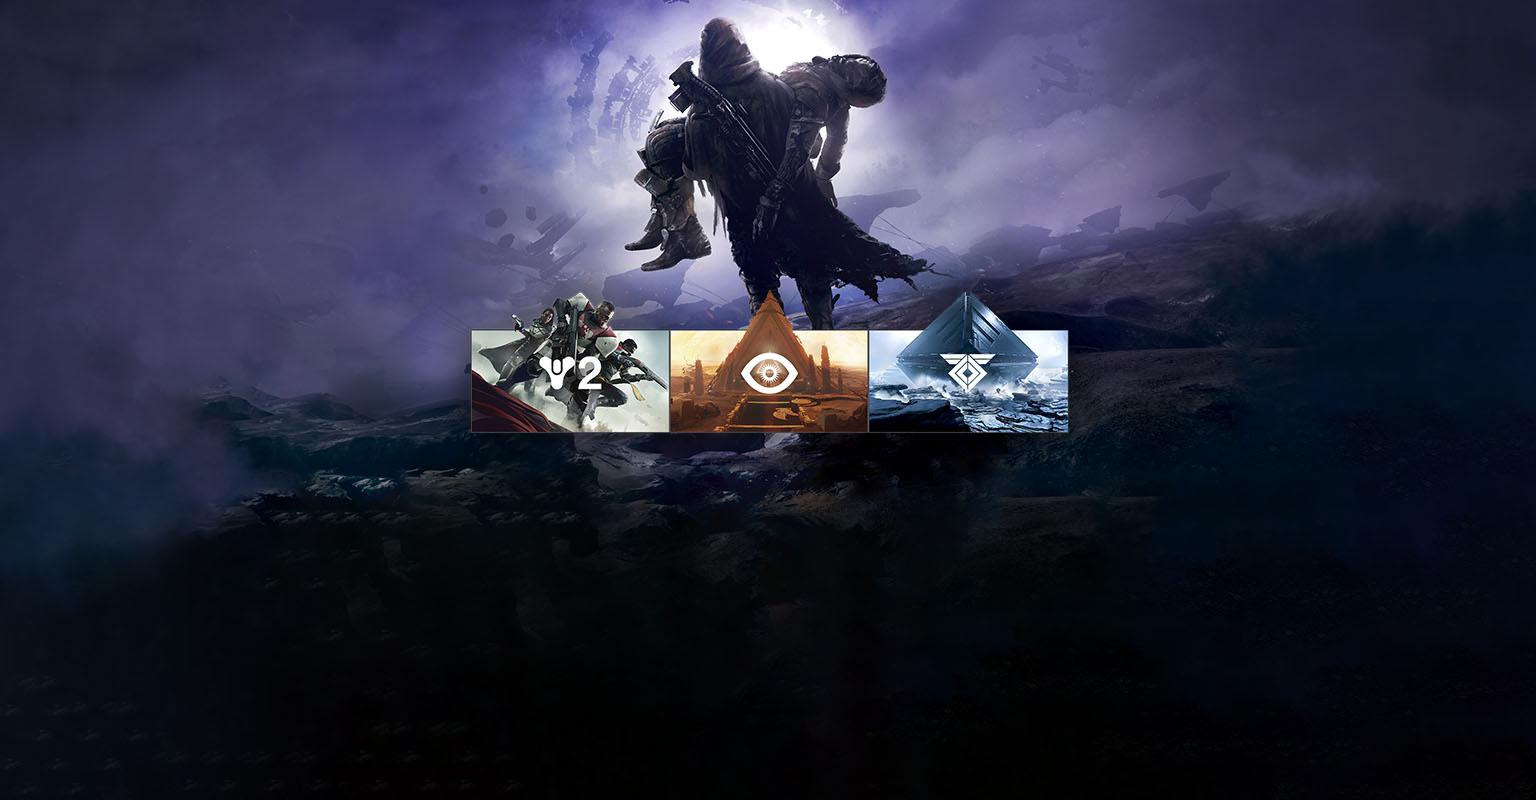 Destiny 2 Forsaken Legendary Collection Blizzard Shop Ps4 Region 3 English